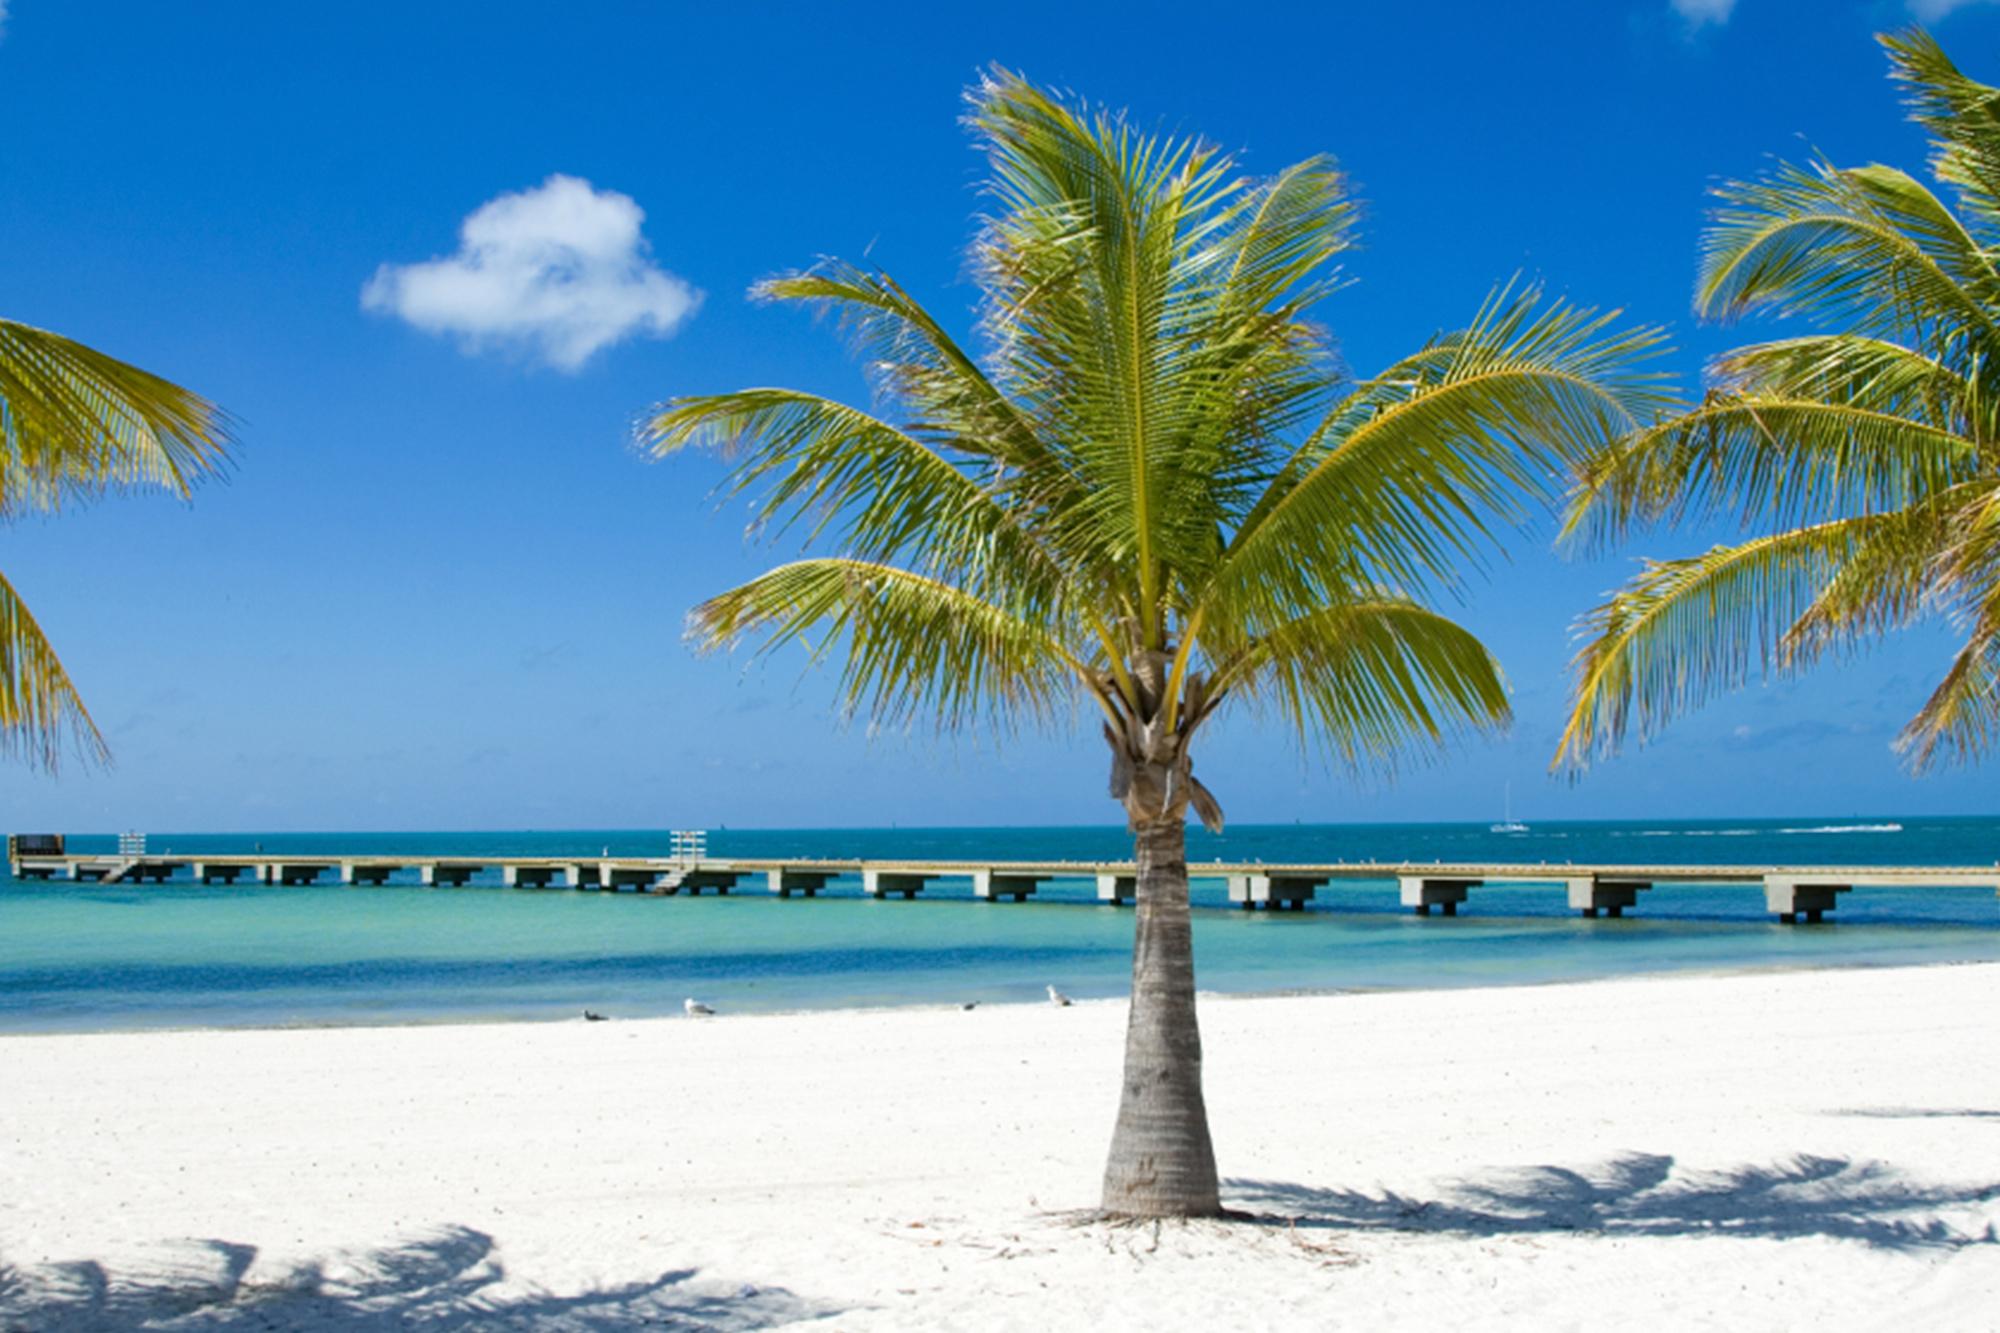 Sunshine Miami Beach Hotel